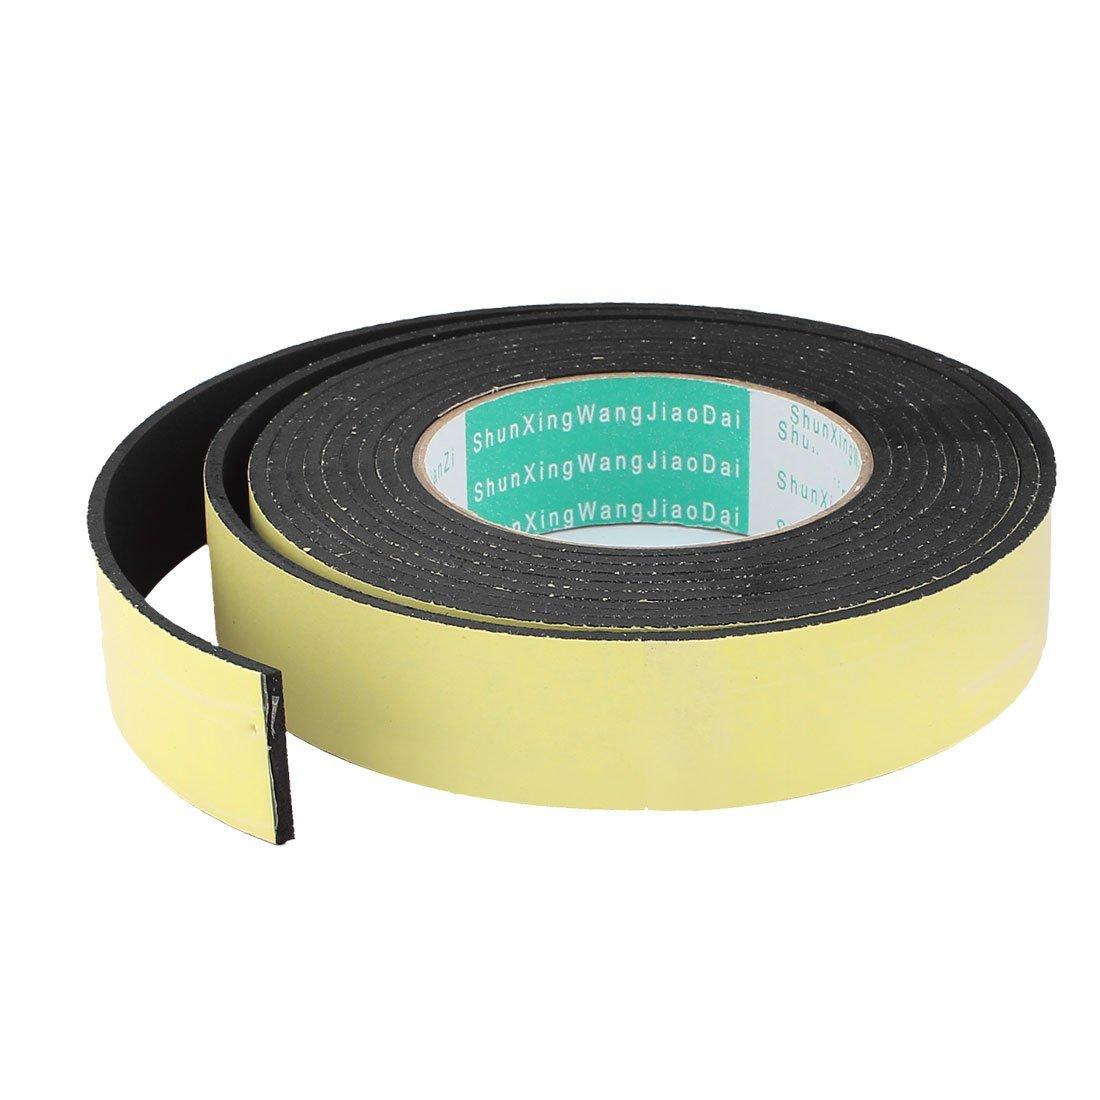 4M 30mm x 3mm Single Side Adhesive Foam Sealing Tape for Door Window DealMux DLM-B015LLQ9RA